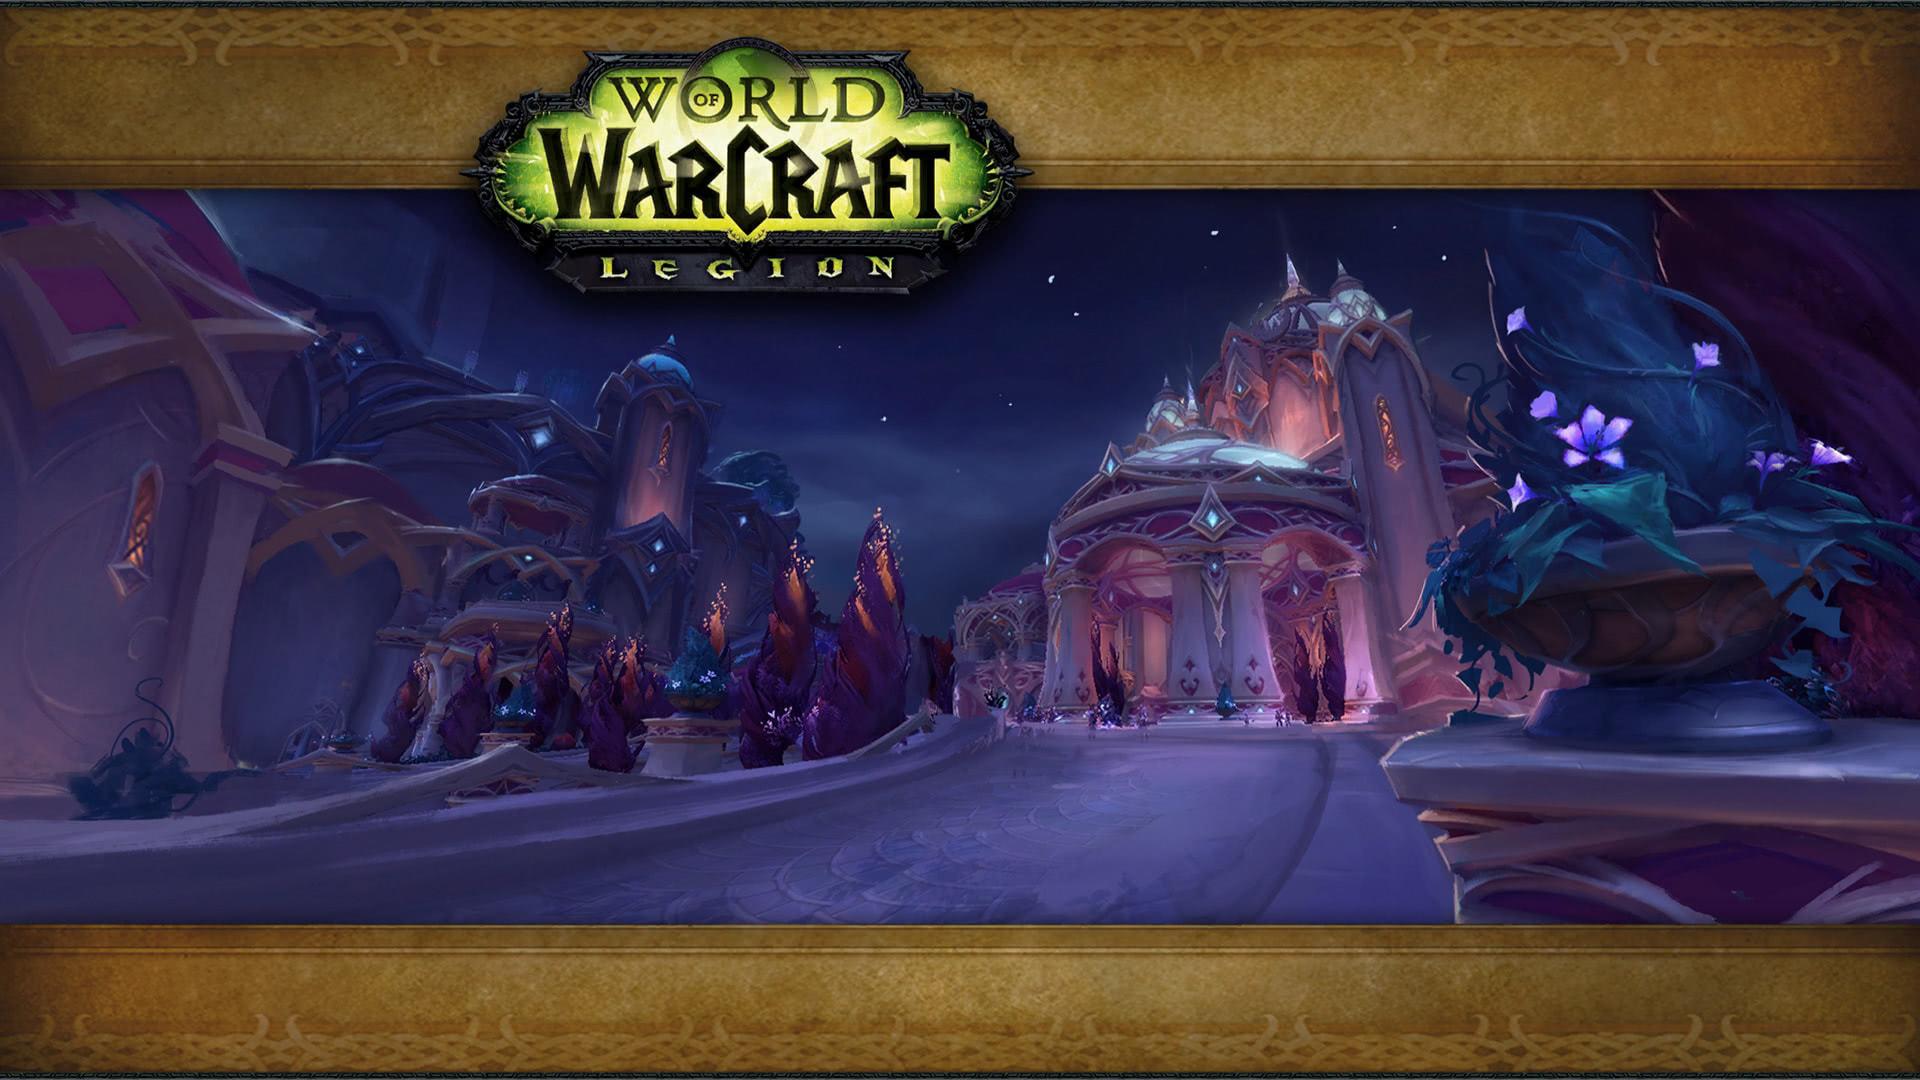 World of warcraft vr night elf - 4 7